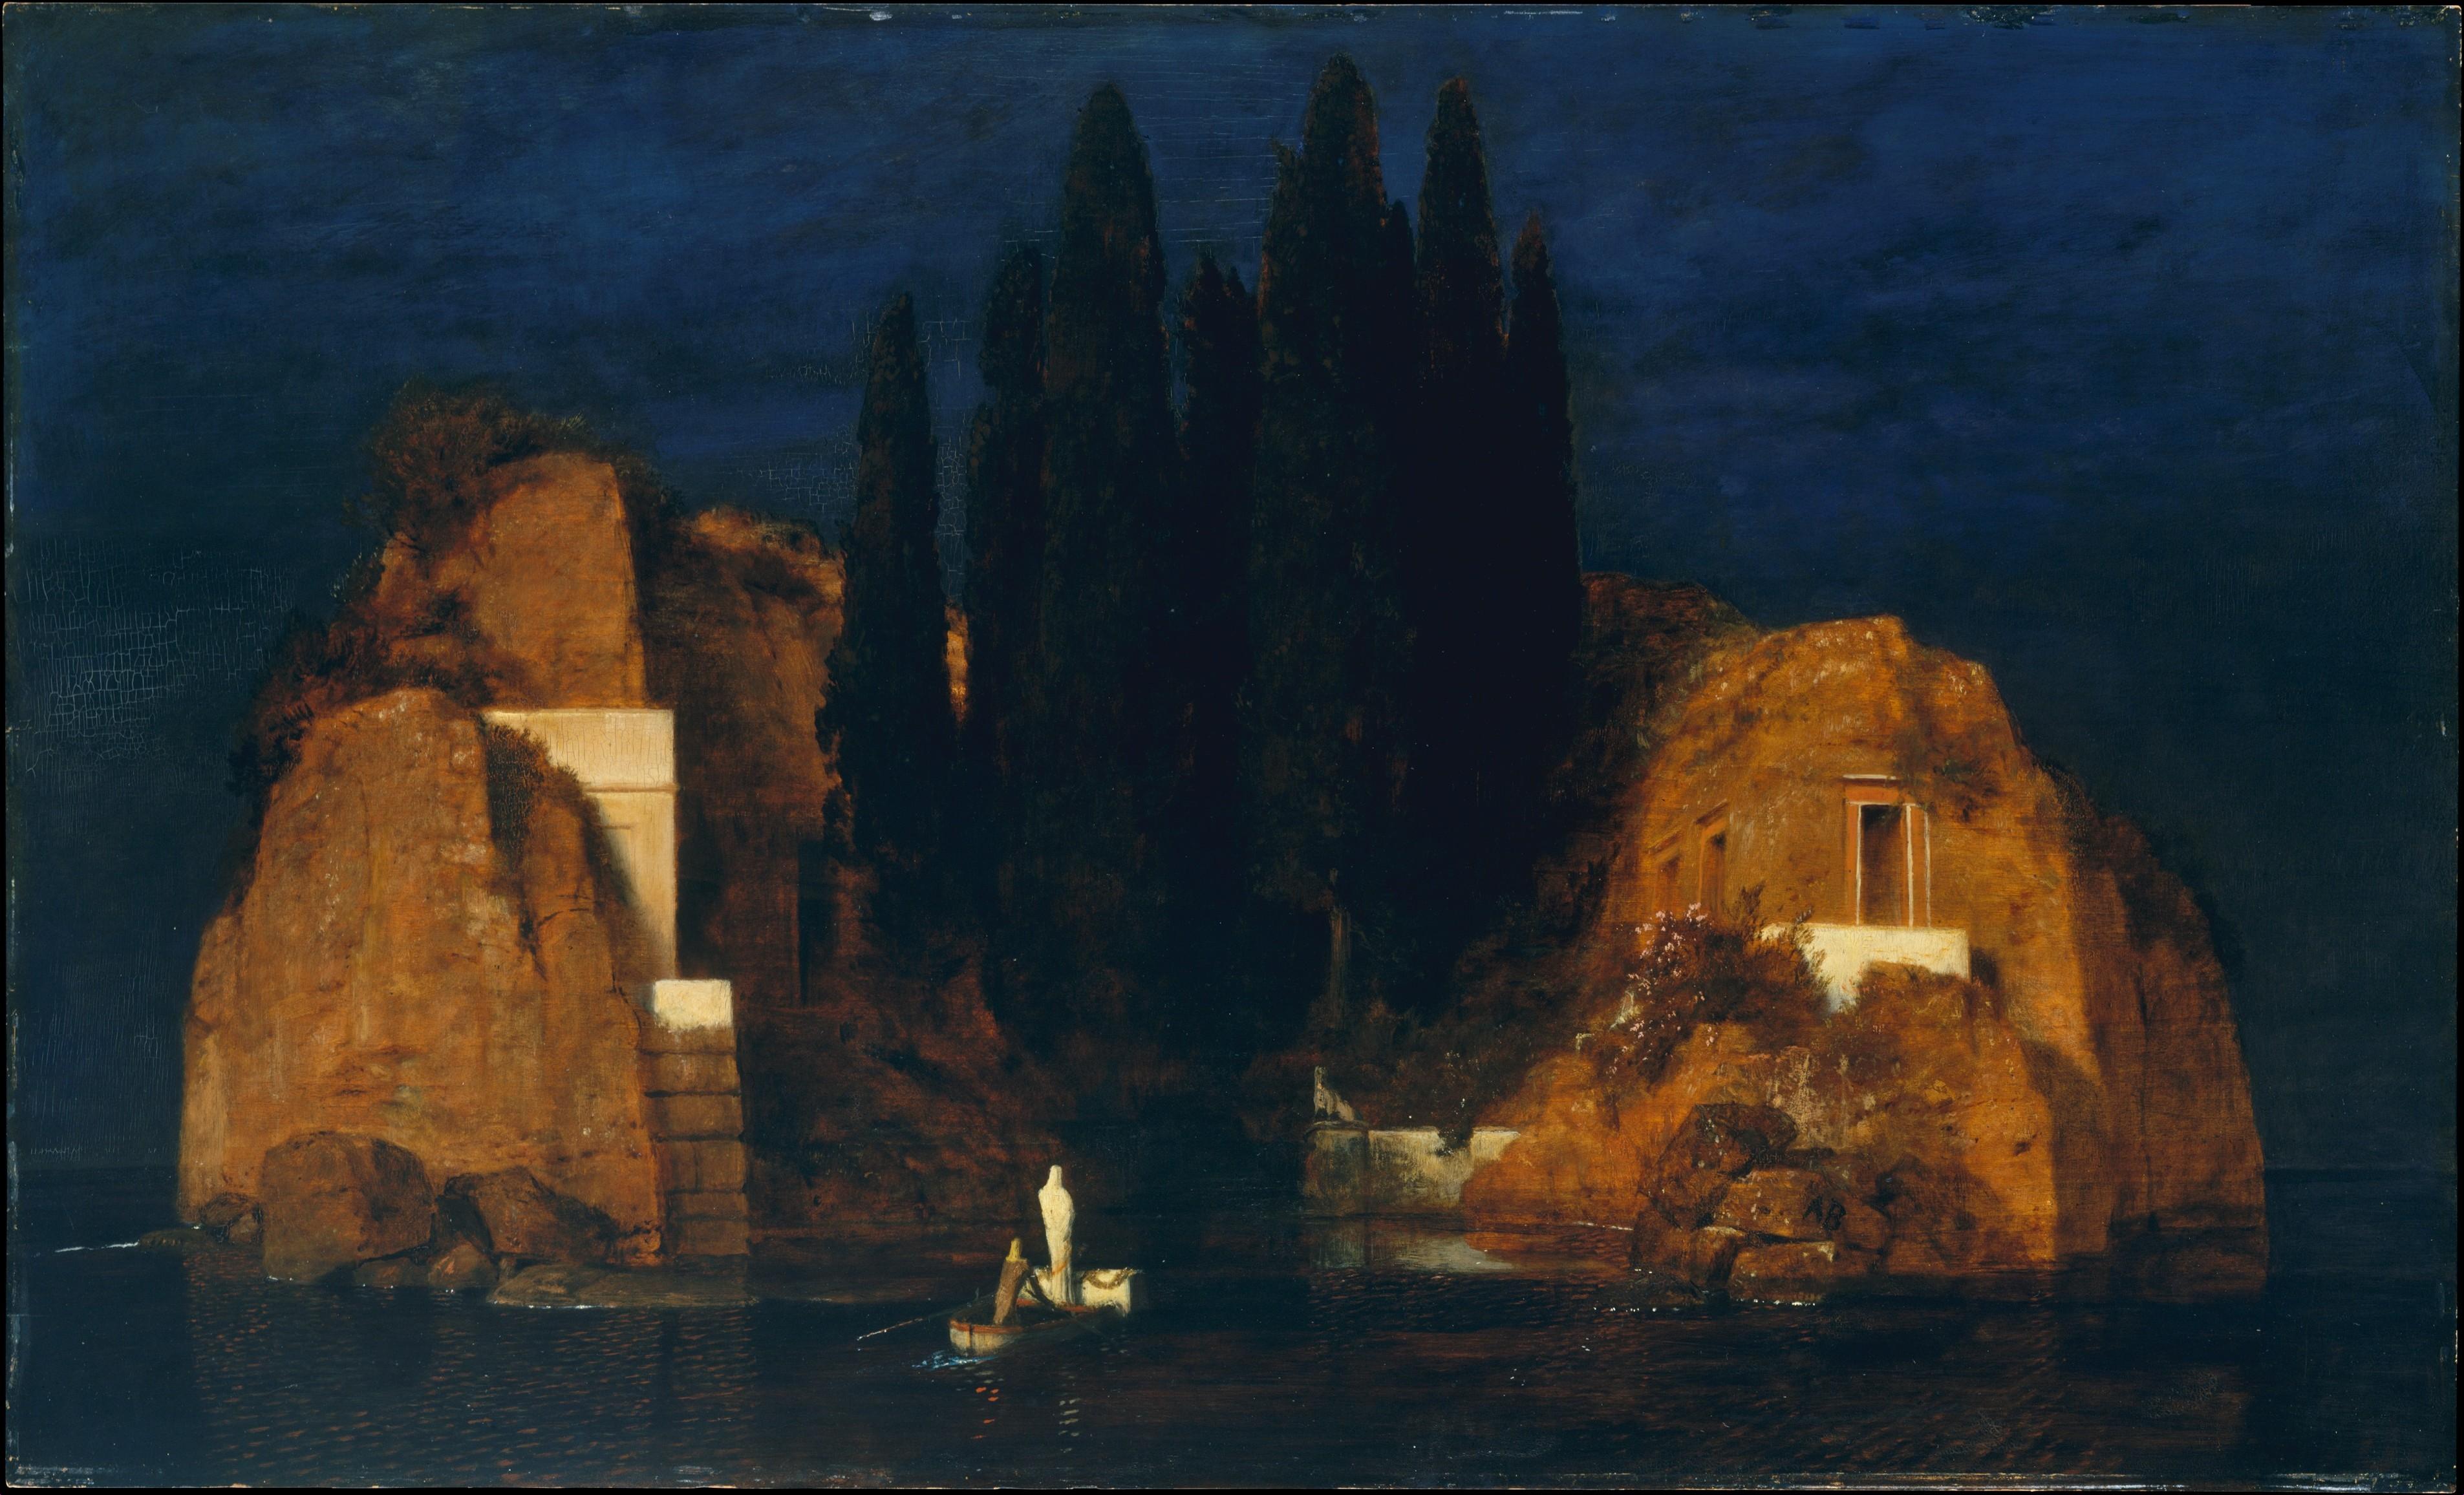 https://upload.wikimedia.org/wikipedia/commons/a/af/Arnold_B%C3%B6cklin_-_Die_Toteninsel_II_(Metropolitan_Museum_of_Art).jpg